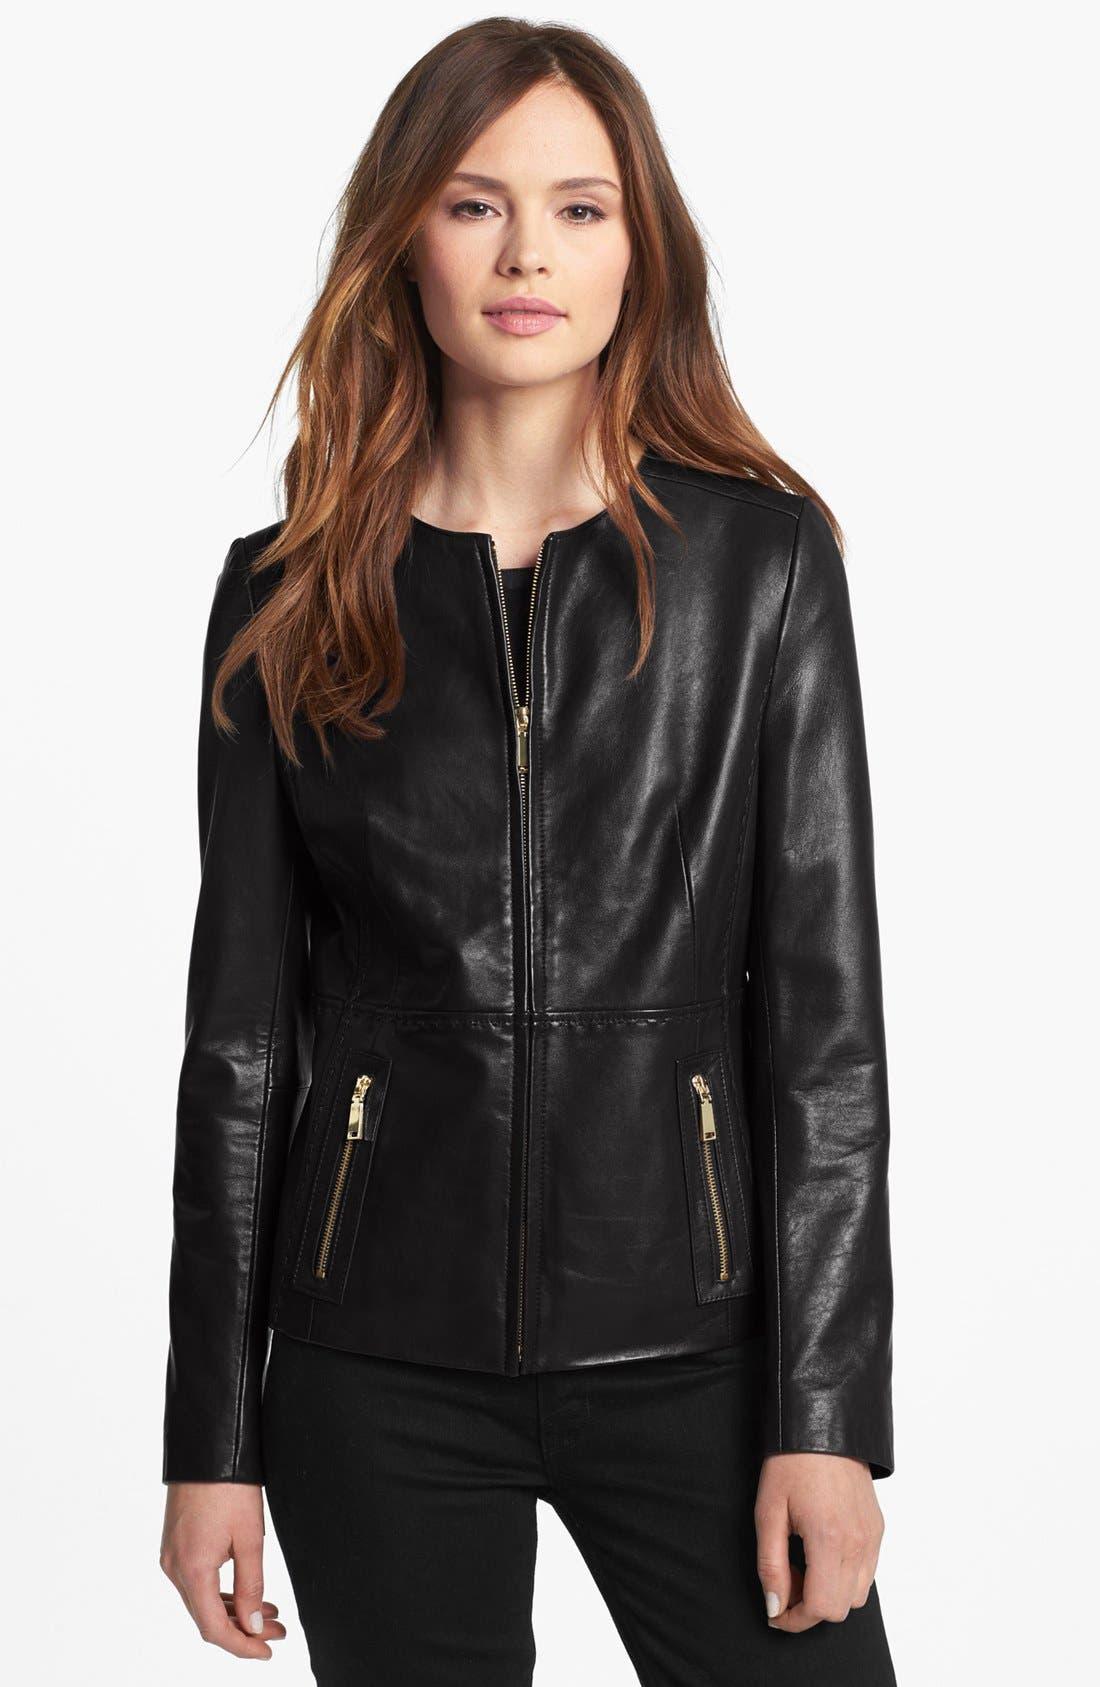 Alternate Image 1 Selected - Tahari Collarless Leather Jacket (Regular & Petite)